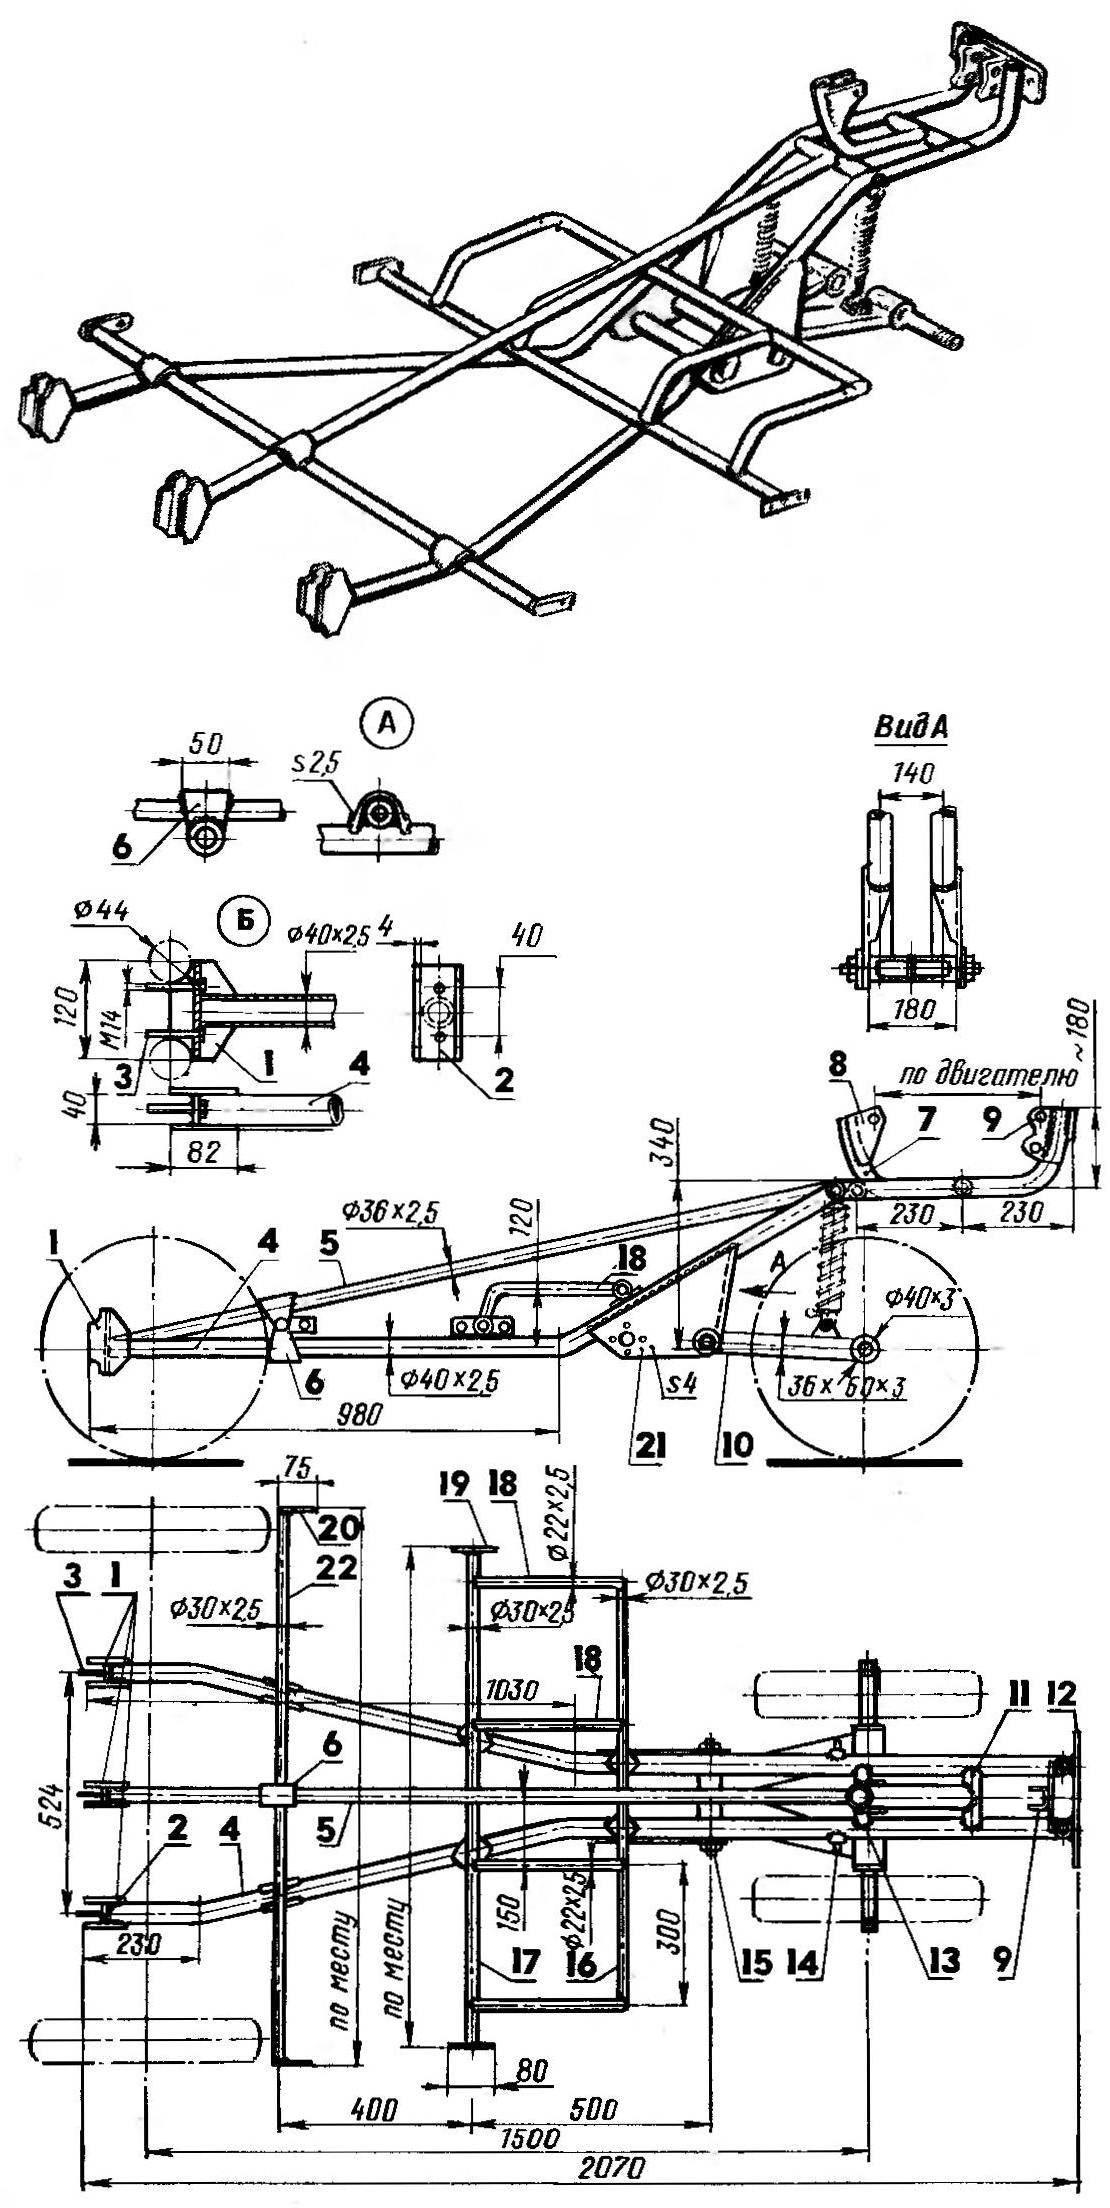 Р и с. 3. Рама микроавтомобиля с рычагами задней подвески